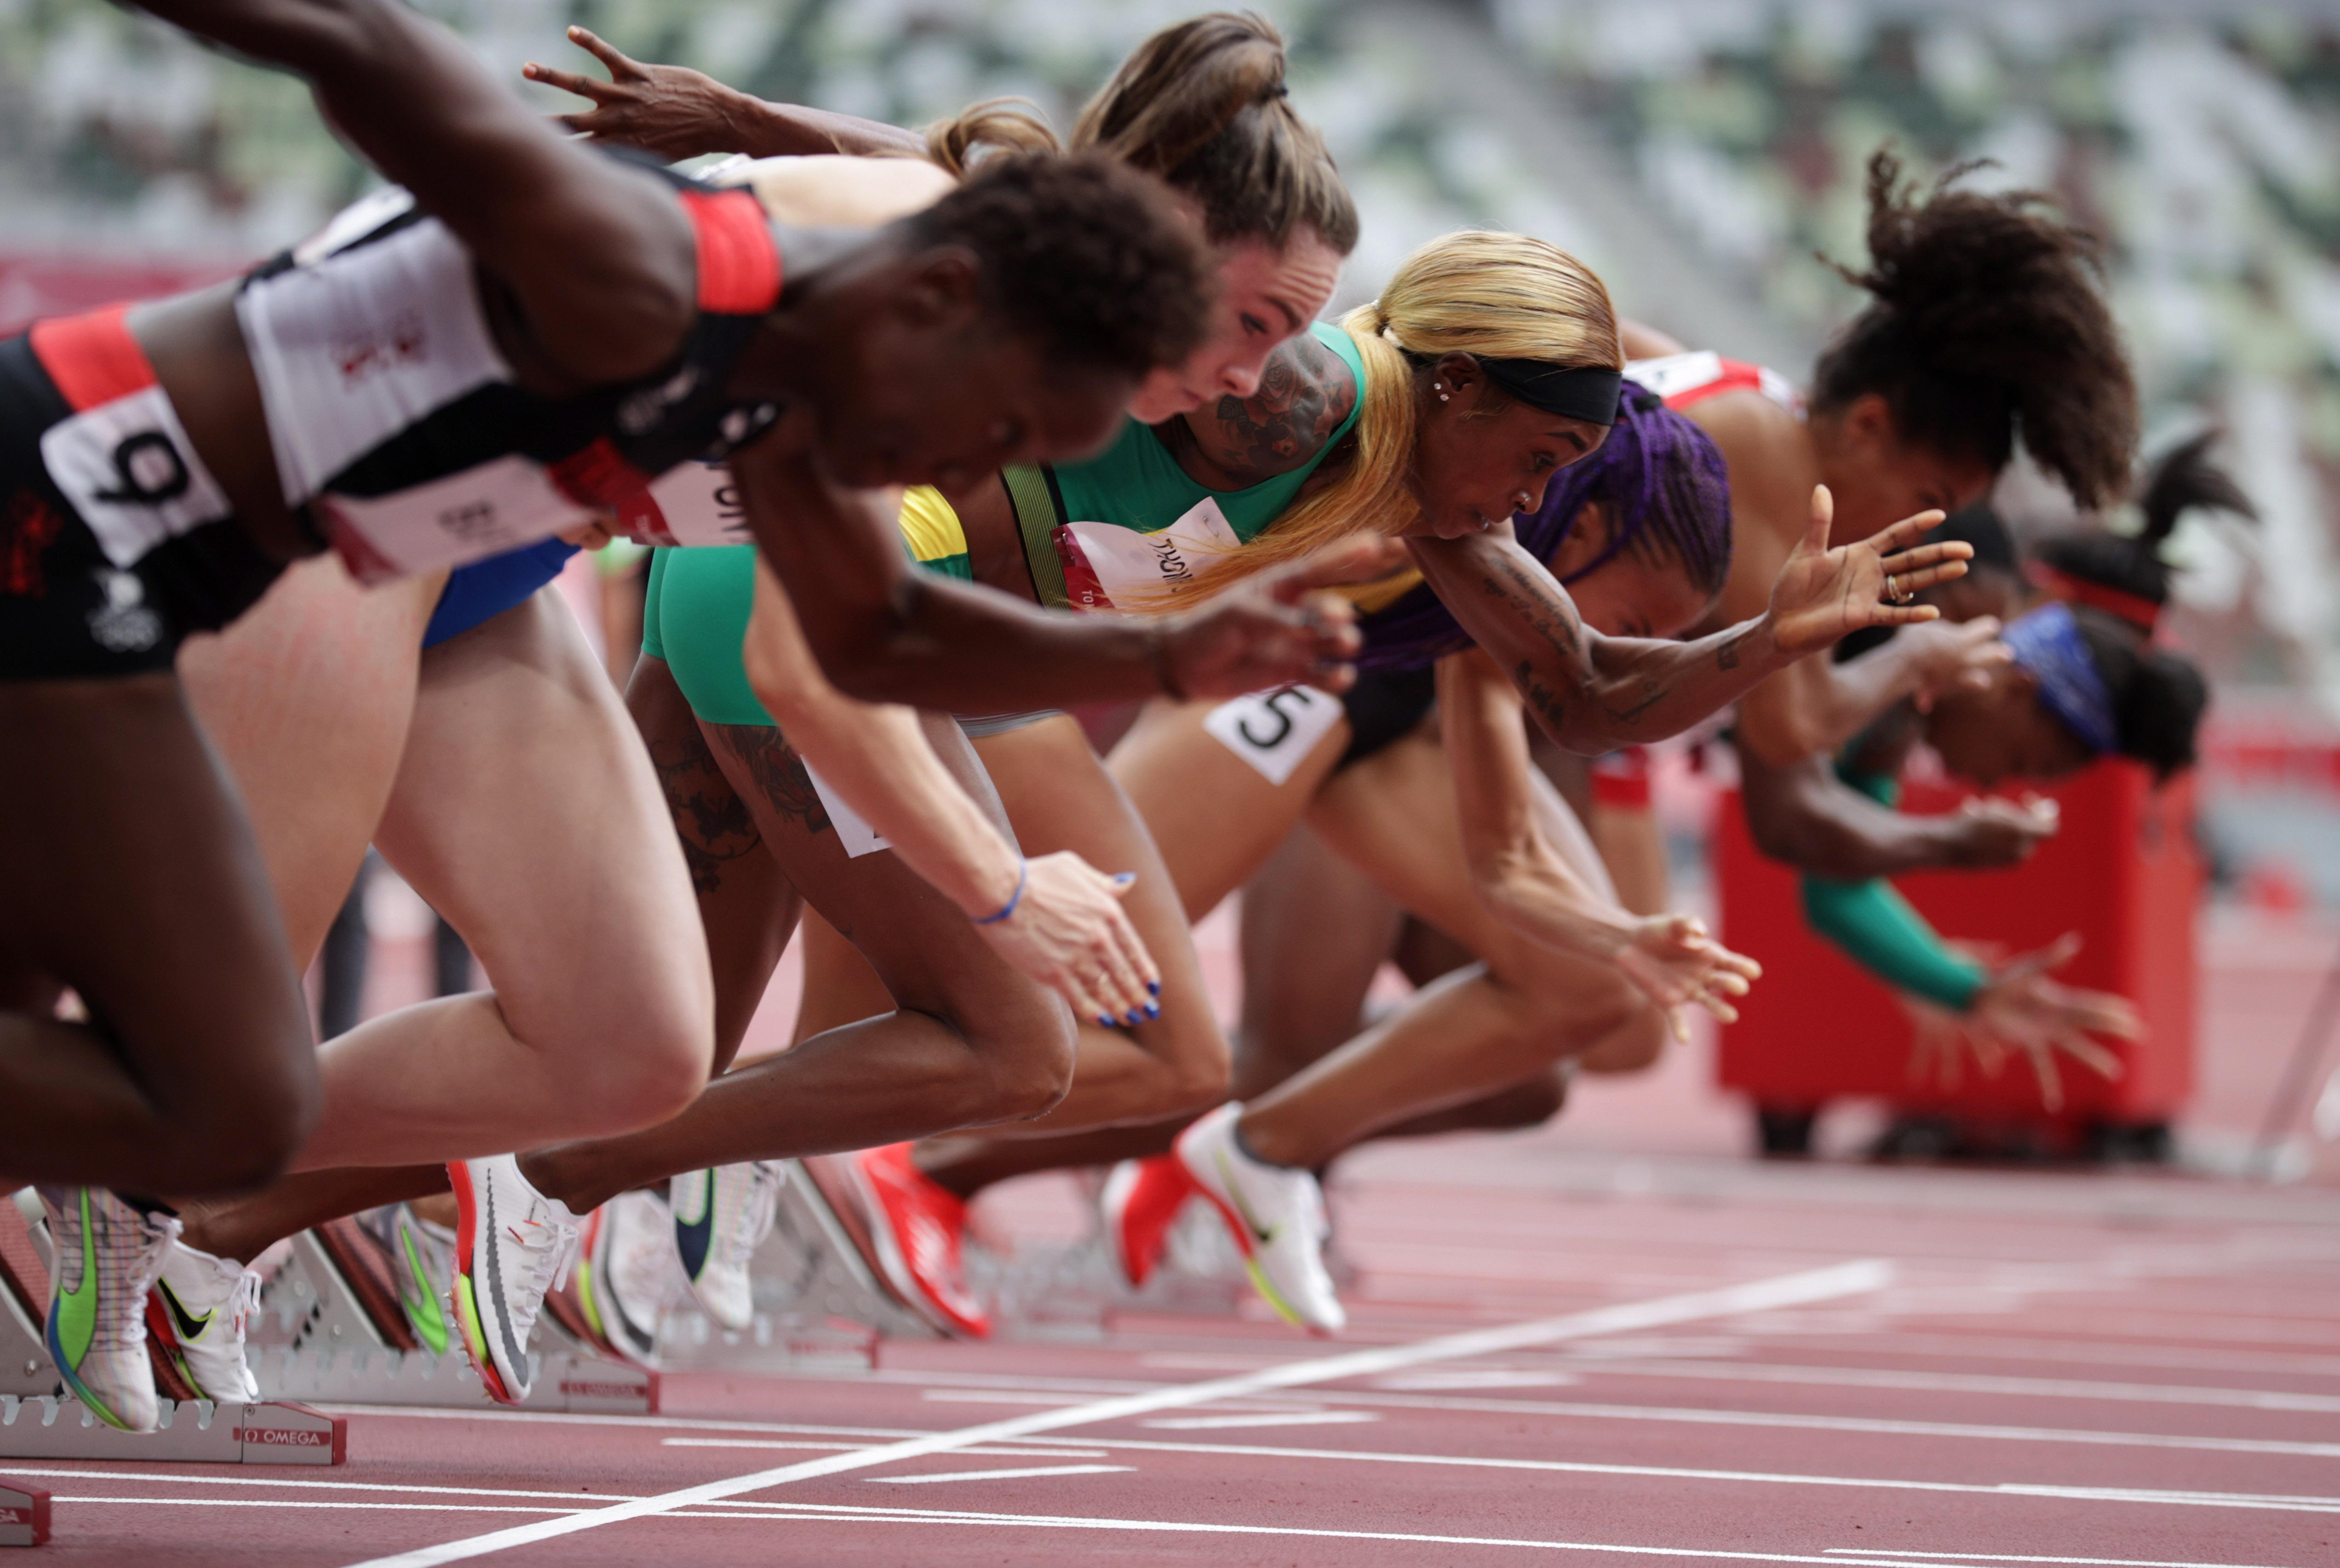 Tokyo 2020 Olympics - Athletics - Women's 100m - Round 1 - OLS - Olympic Stadium, Tokyo, Japan - July 30, 2021. Elaine Thompson-Herah of Jamaica in action at the start of Heat 2 REUTERS/Hannah Mckay